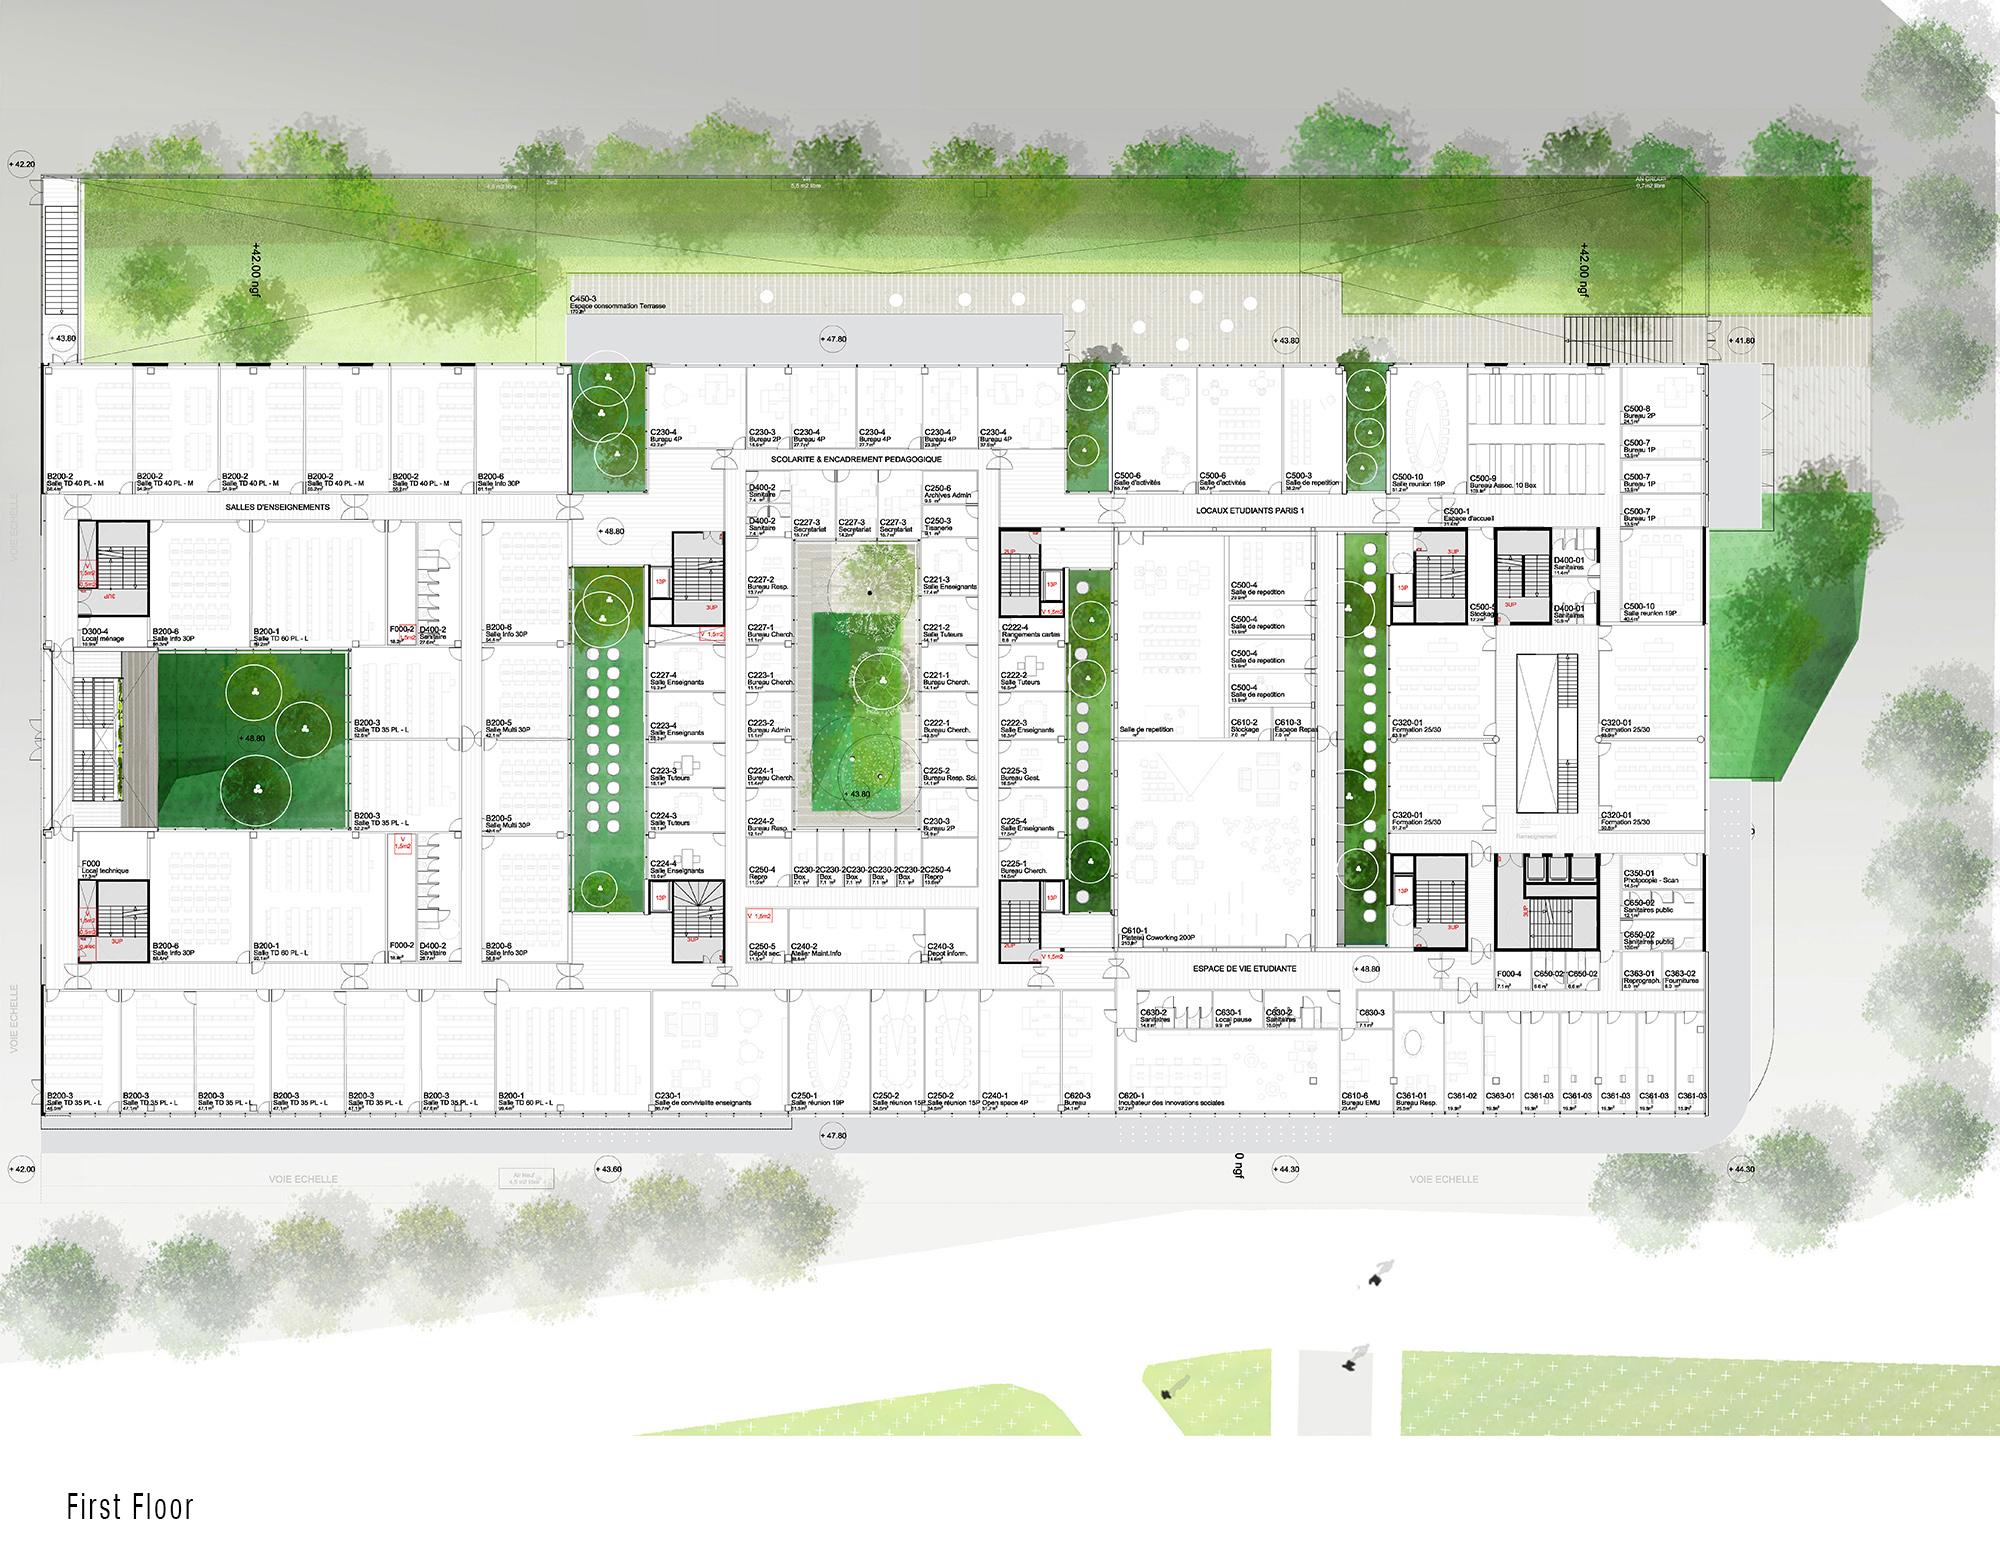 First Floor - Condorcet Campus - Josep Lluís Mateo